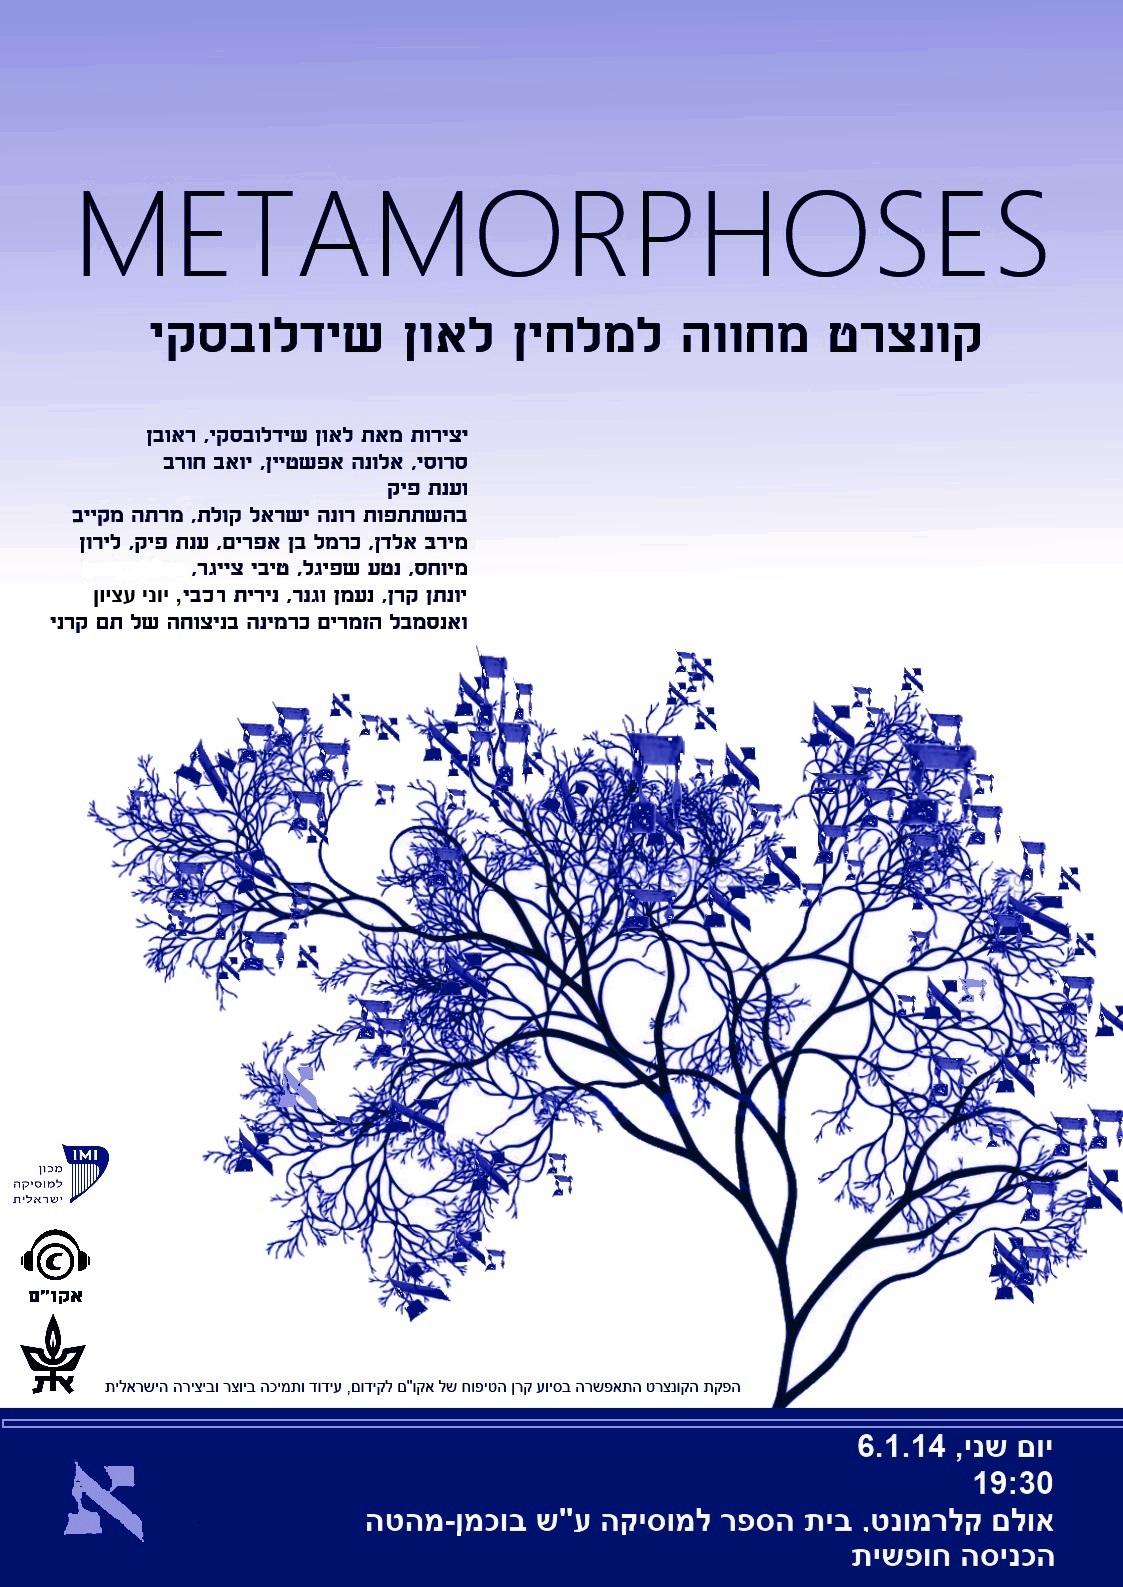 Metamorphoses concert poster final.jpg